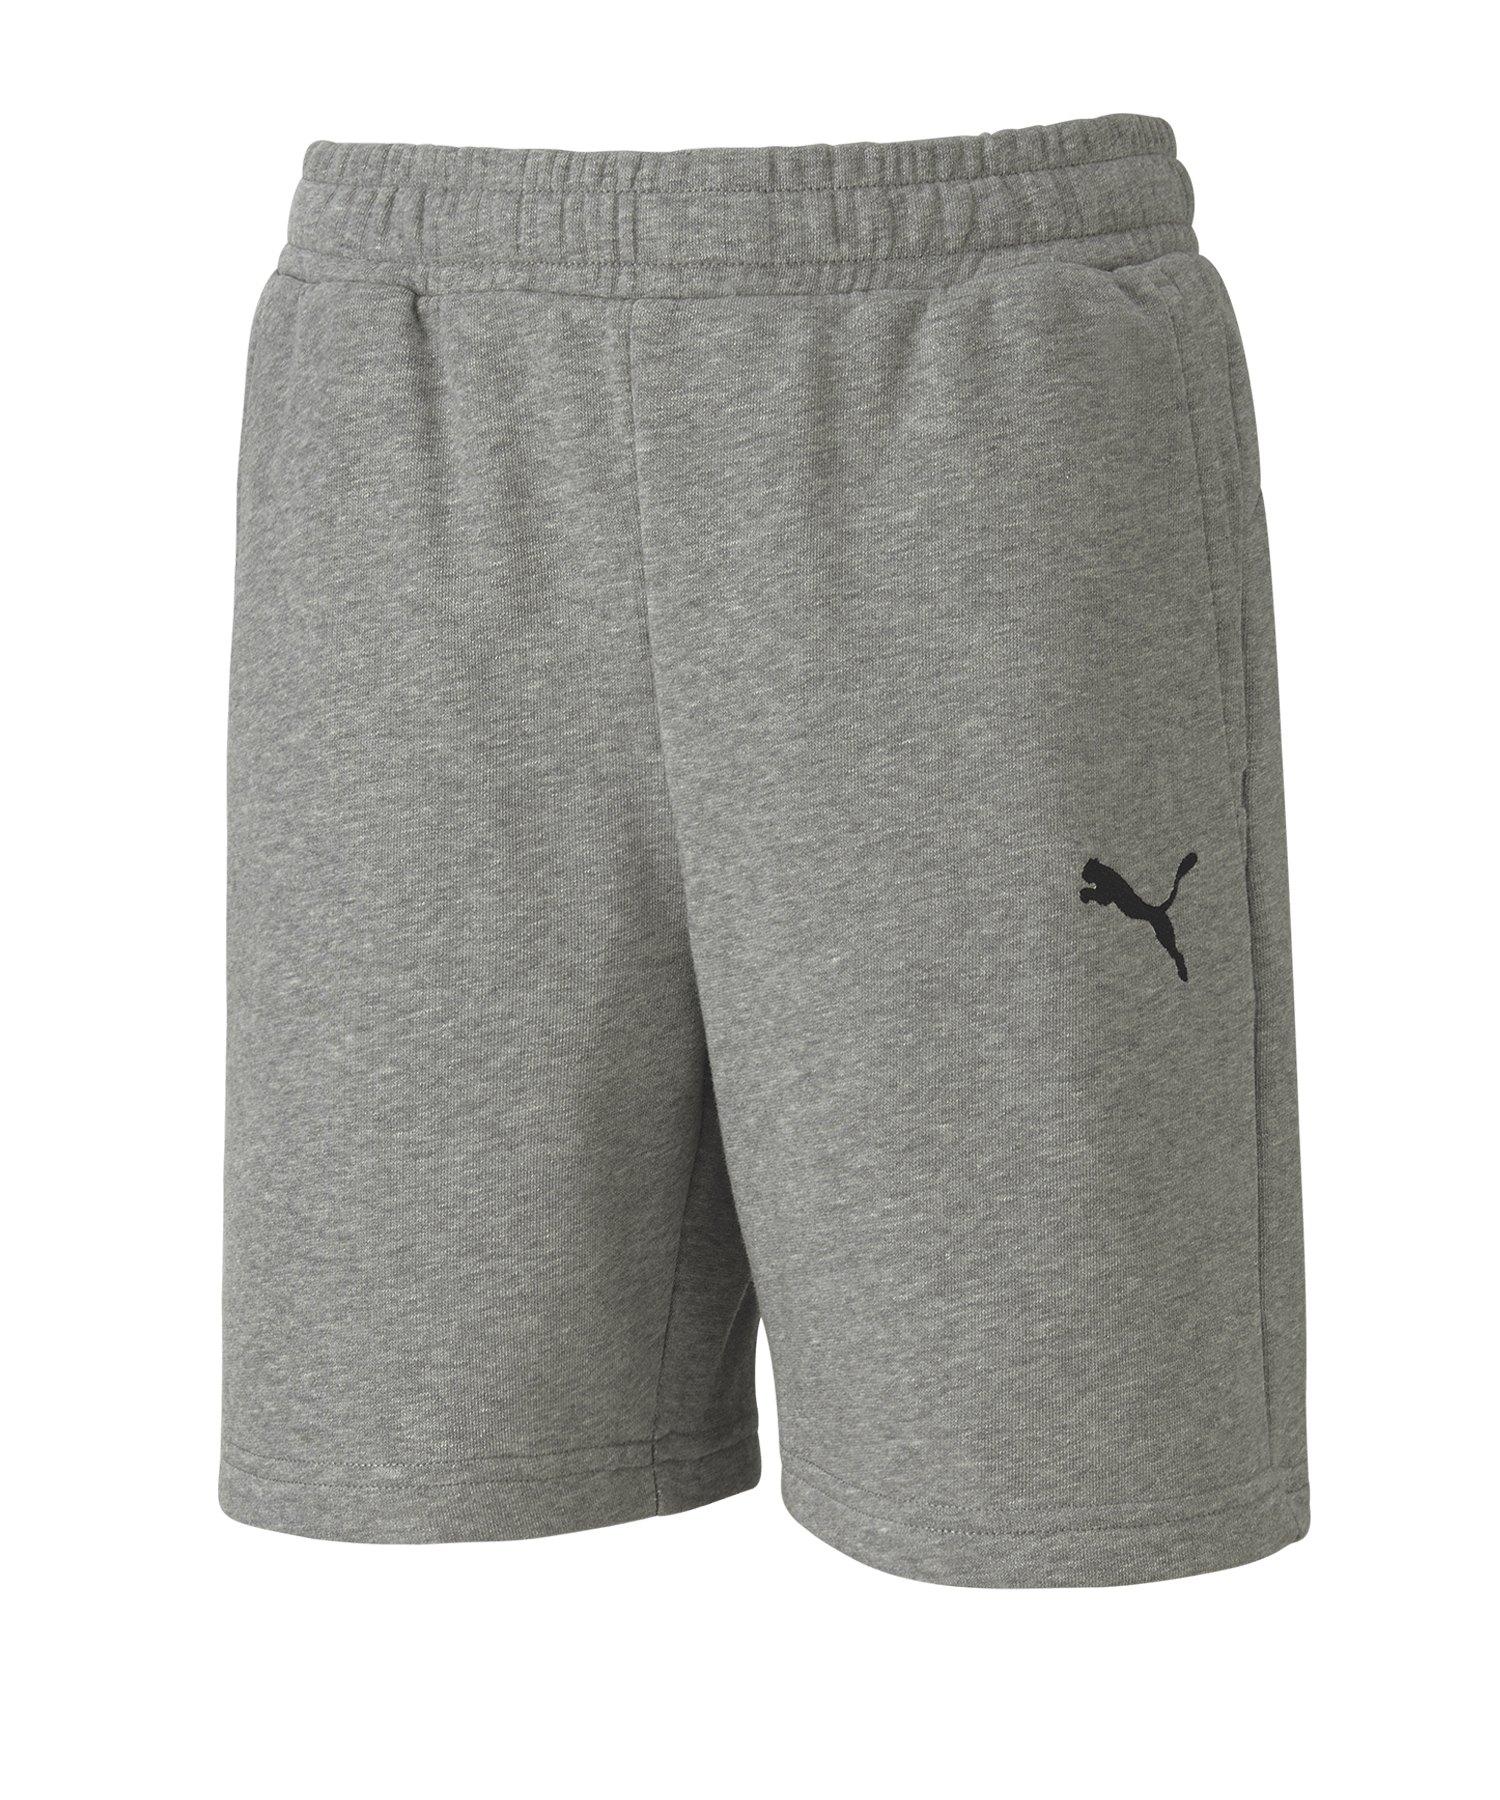 PUMA teamGOAL 23 Casuals Shorts Kids Grau F33 - grau